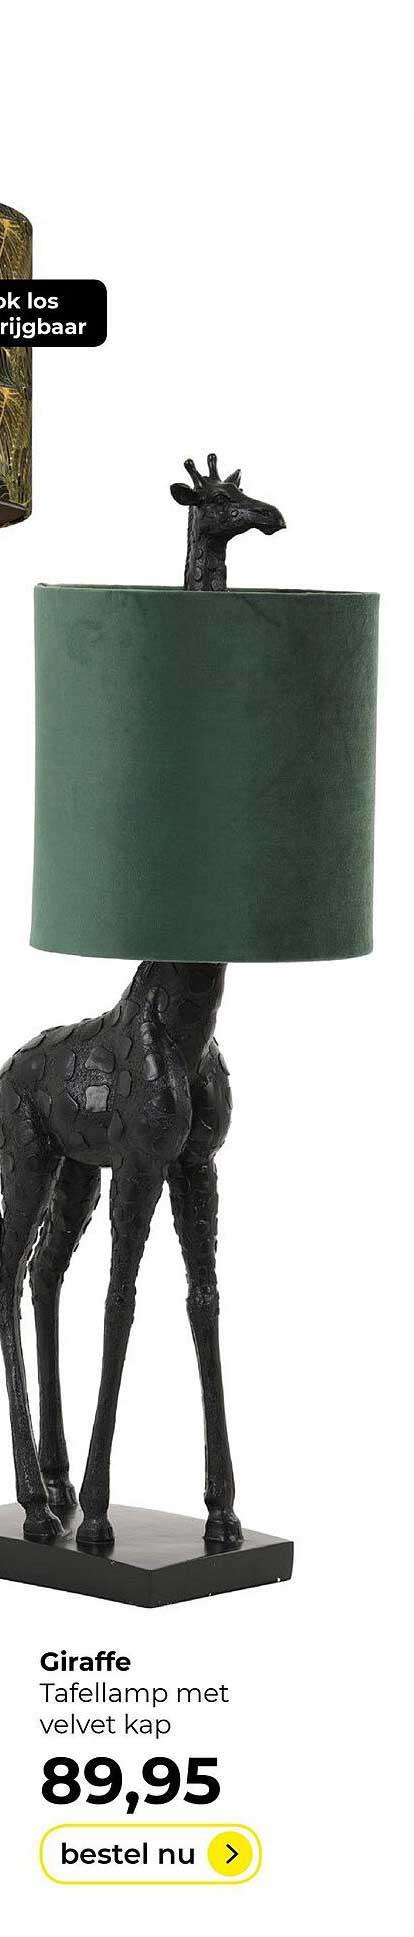 Lampidee Giraffe Tafellamp Met Velvet Kap